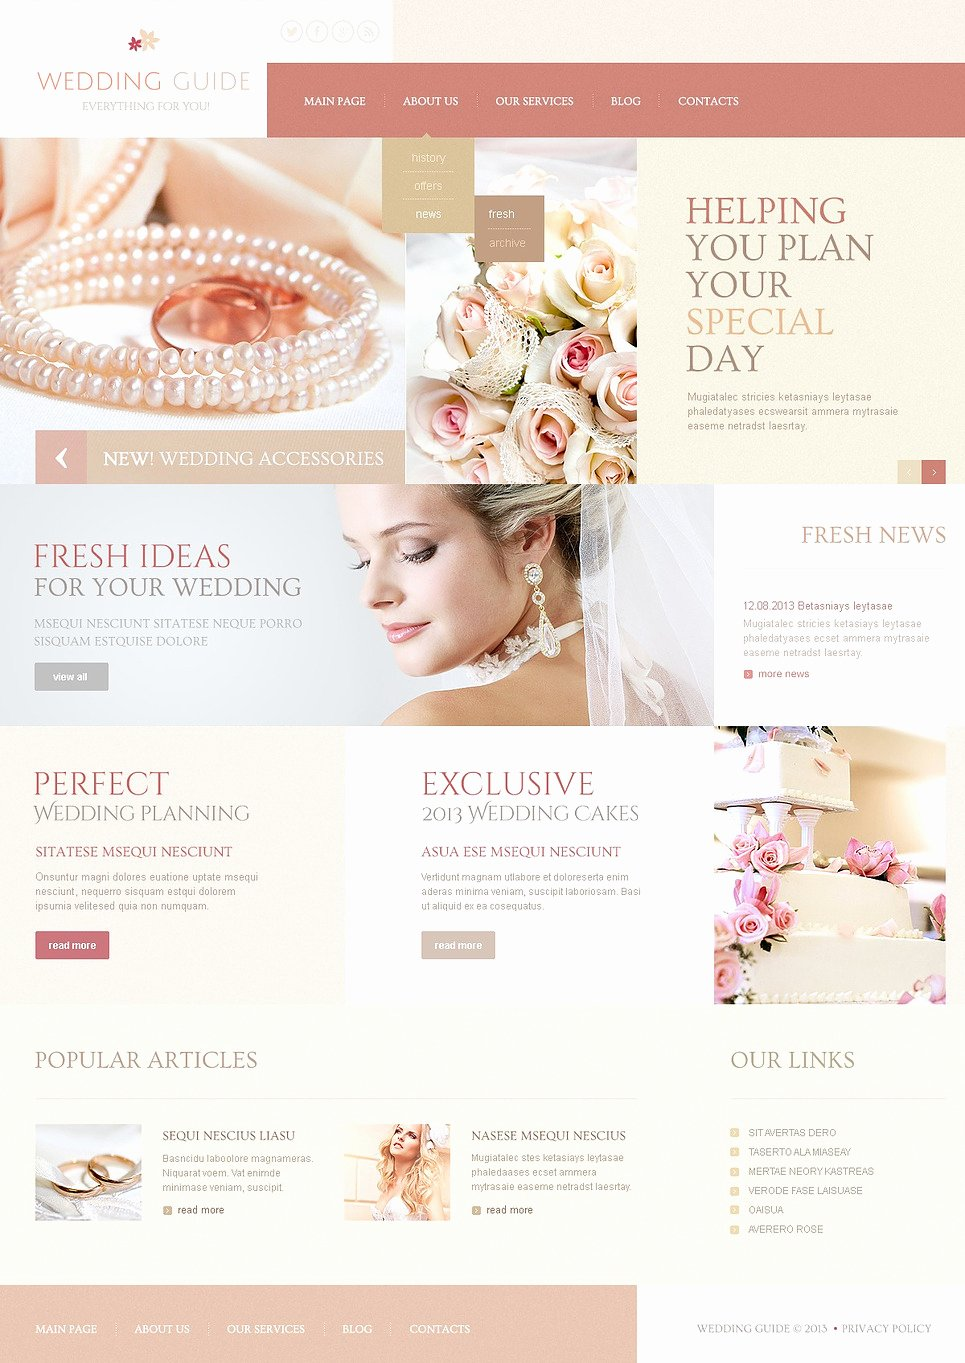 Wedding Planner Website Template New Wedding Guide Joomla Template